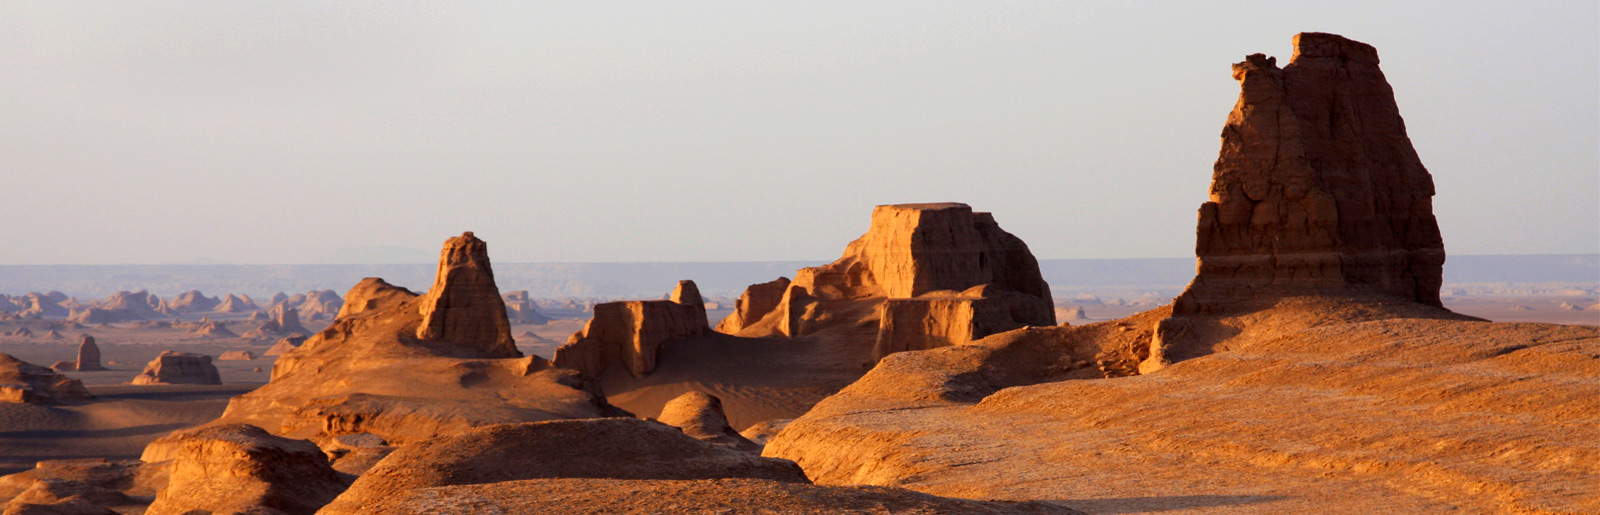 Gandom Beryan and Lut Desert